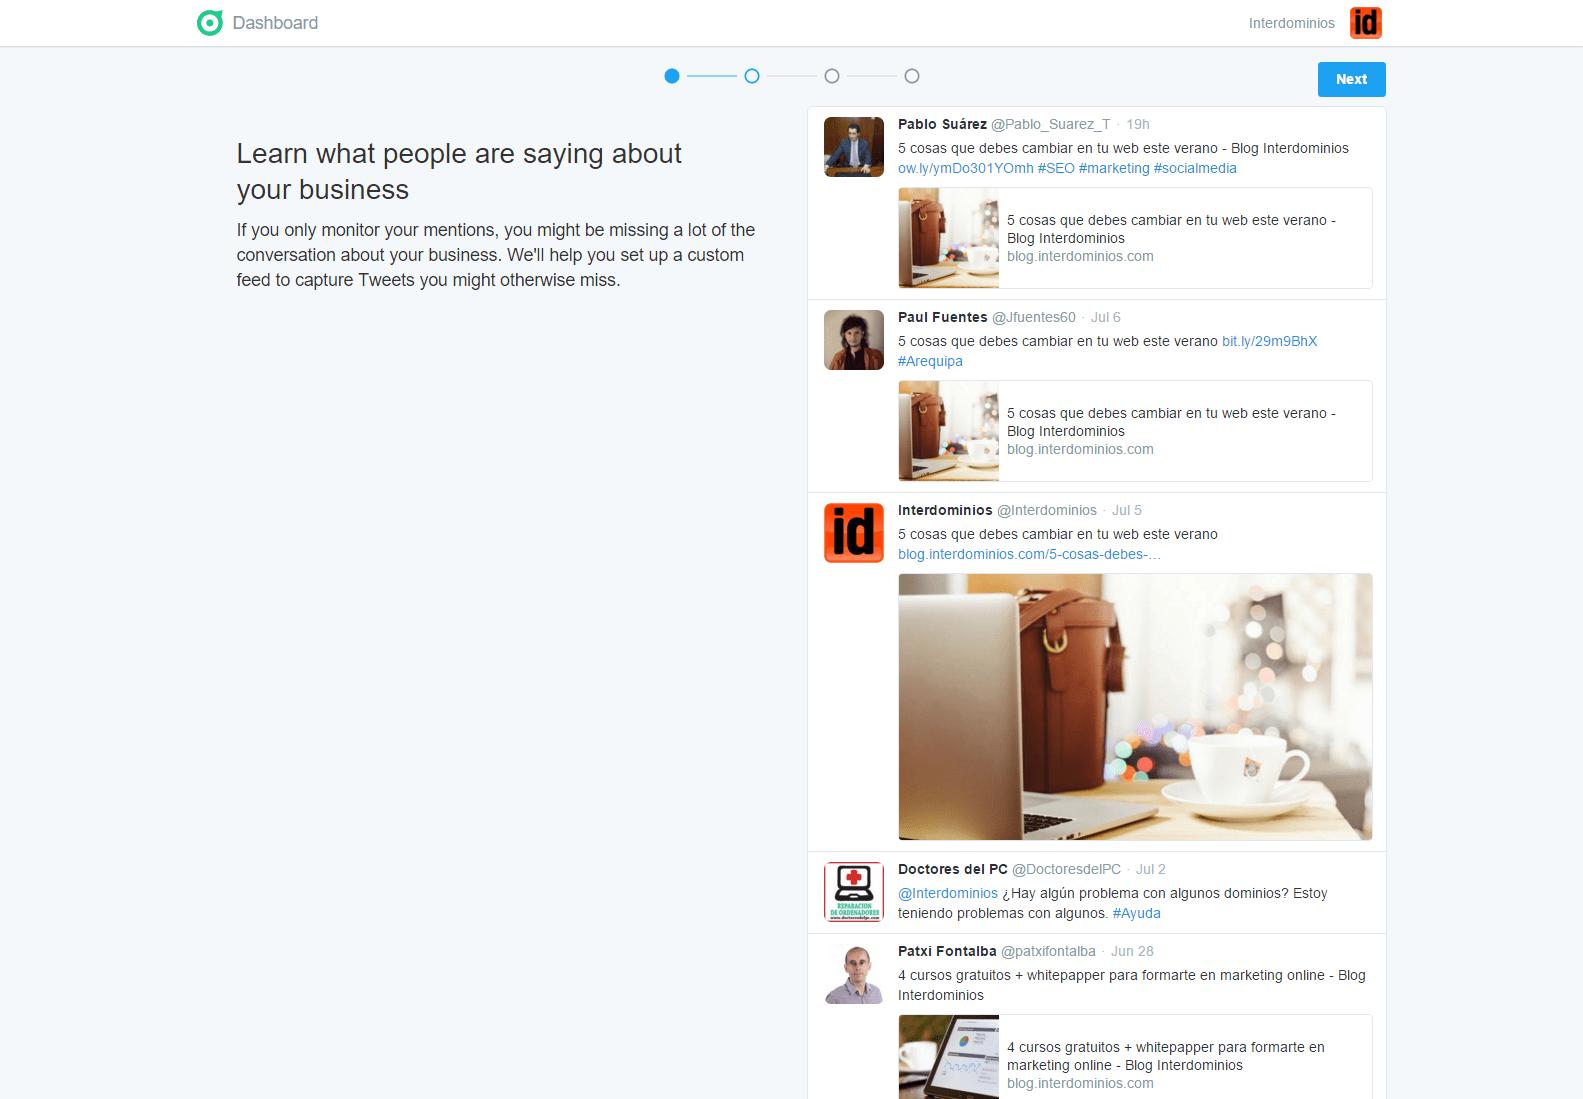 FireShot Capture 4 - Twitter Dashboard - https___dashboard.twitter.com_i_onboard#0